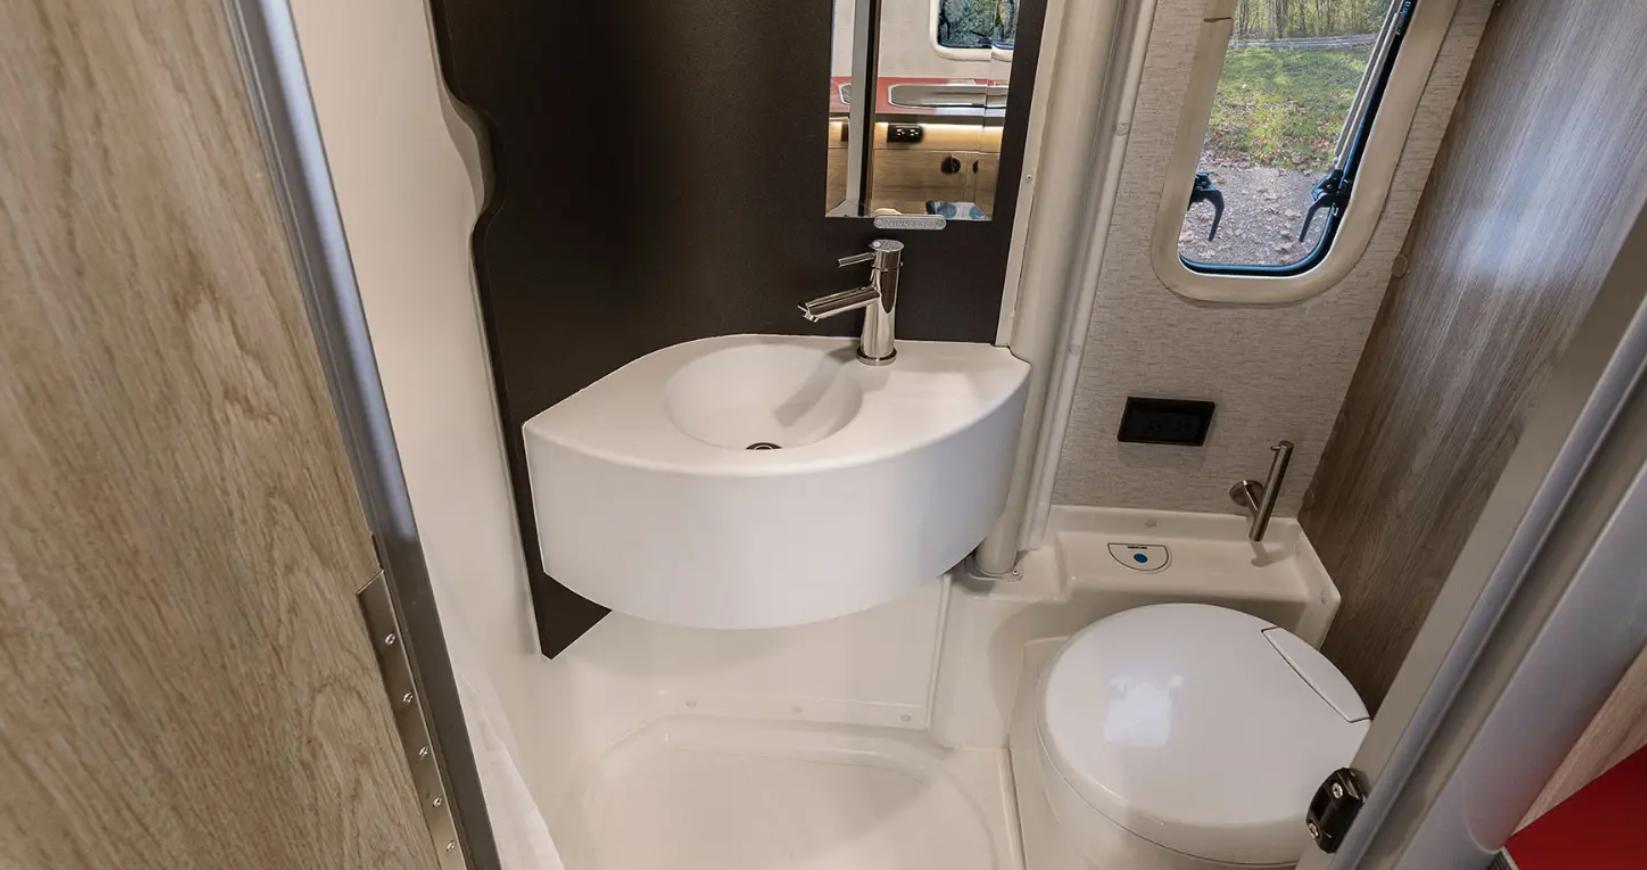 winnebago ekko bathroom